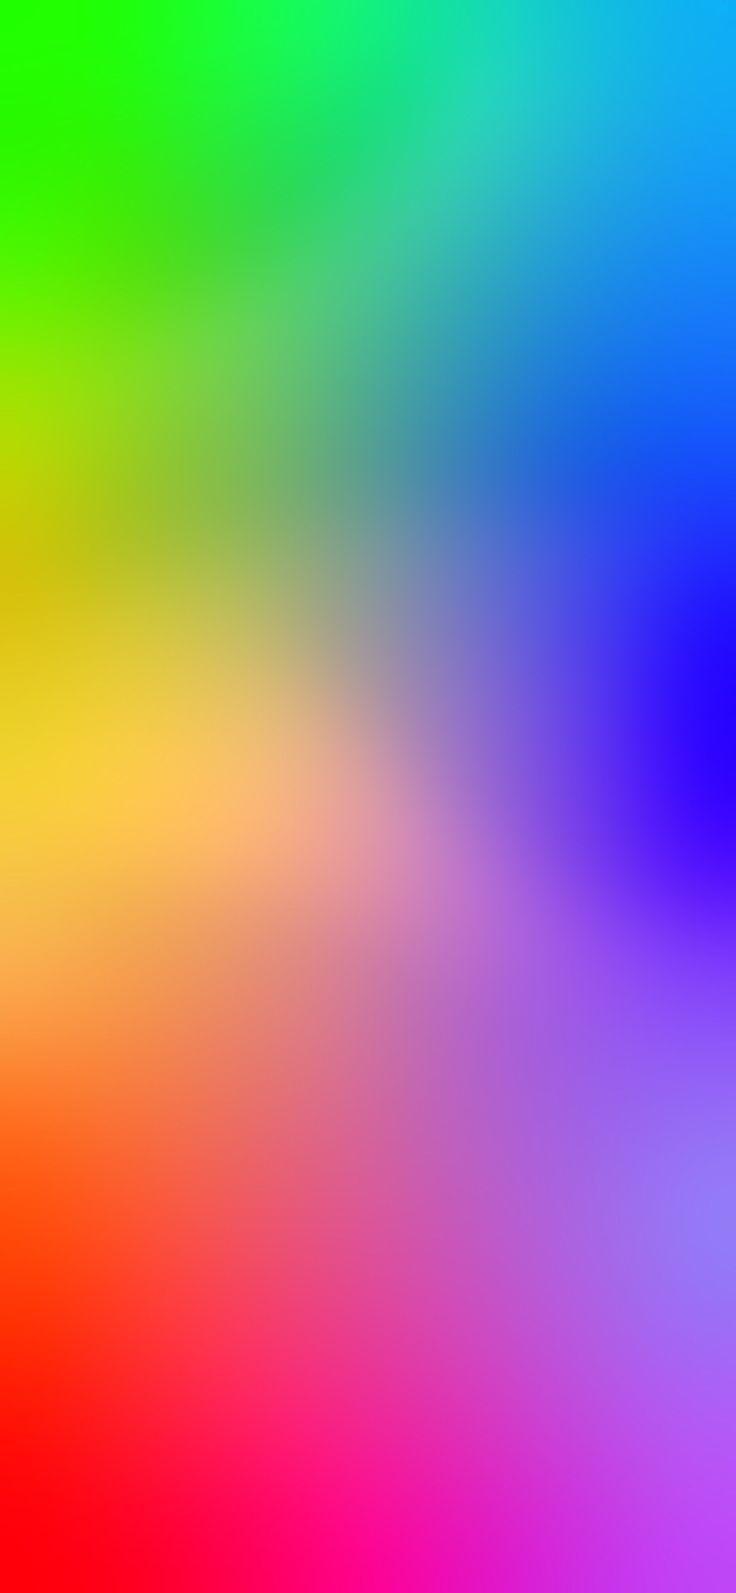 Abstract Hd Wallpapers 274649277261774460 Sfondi Colori E Sfumature